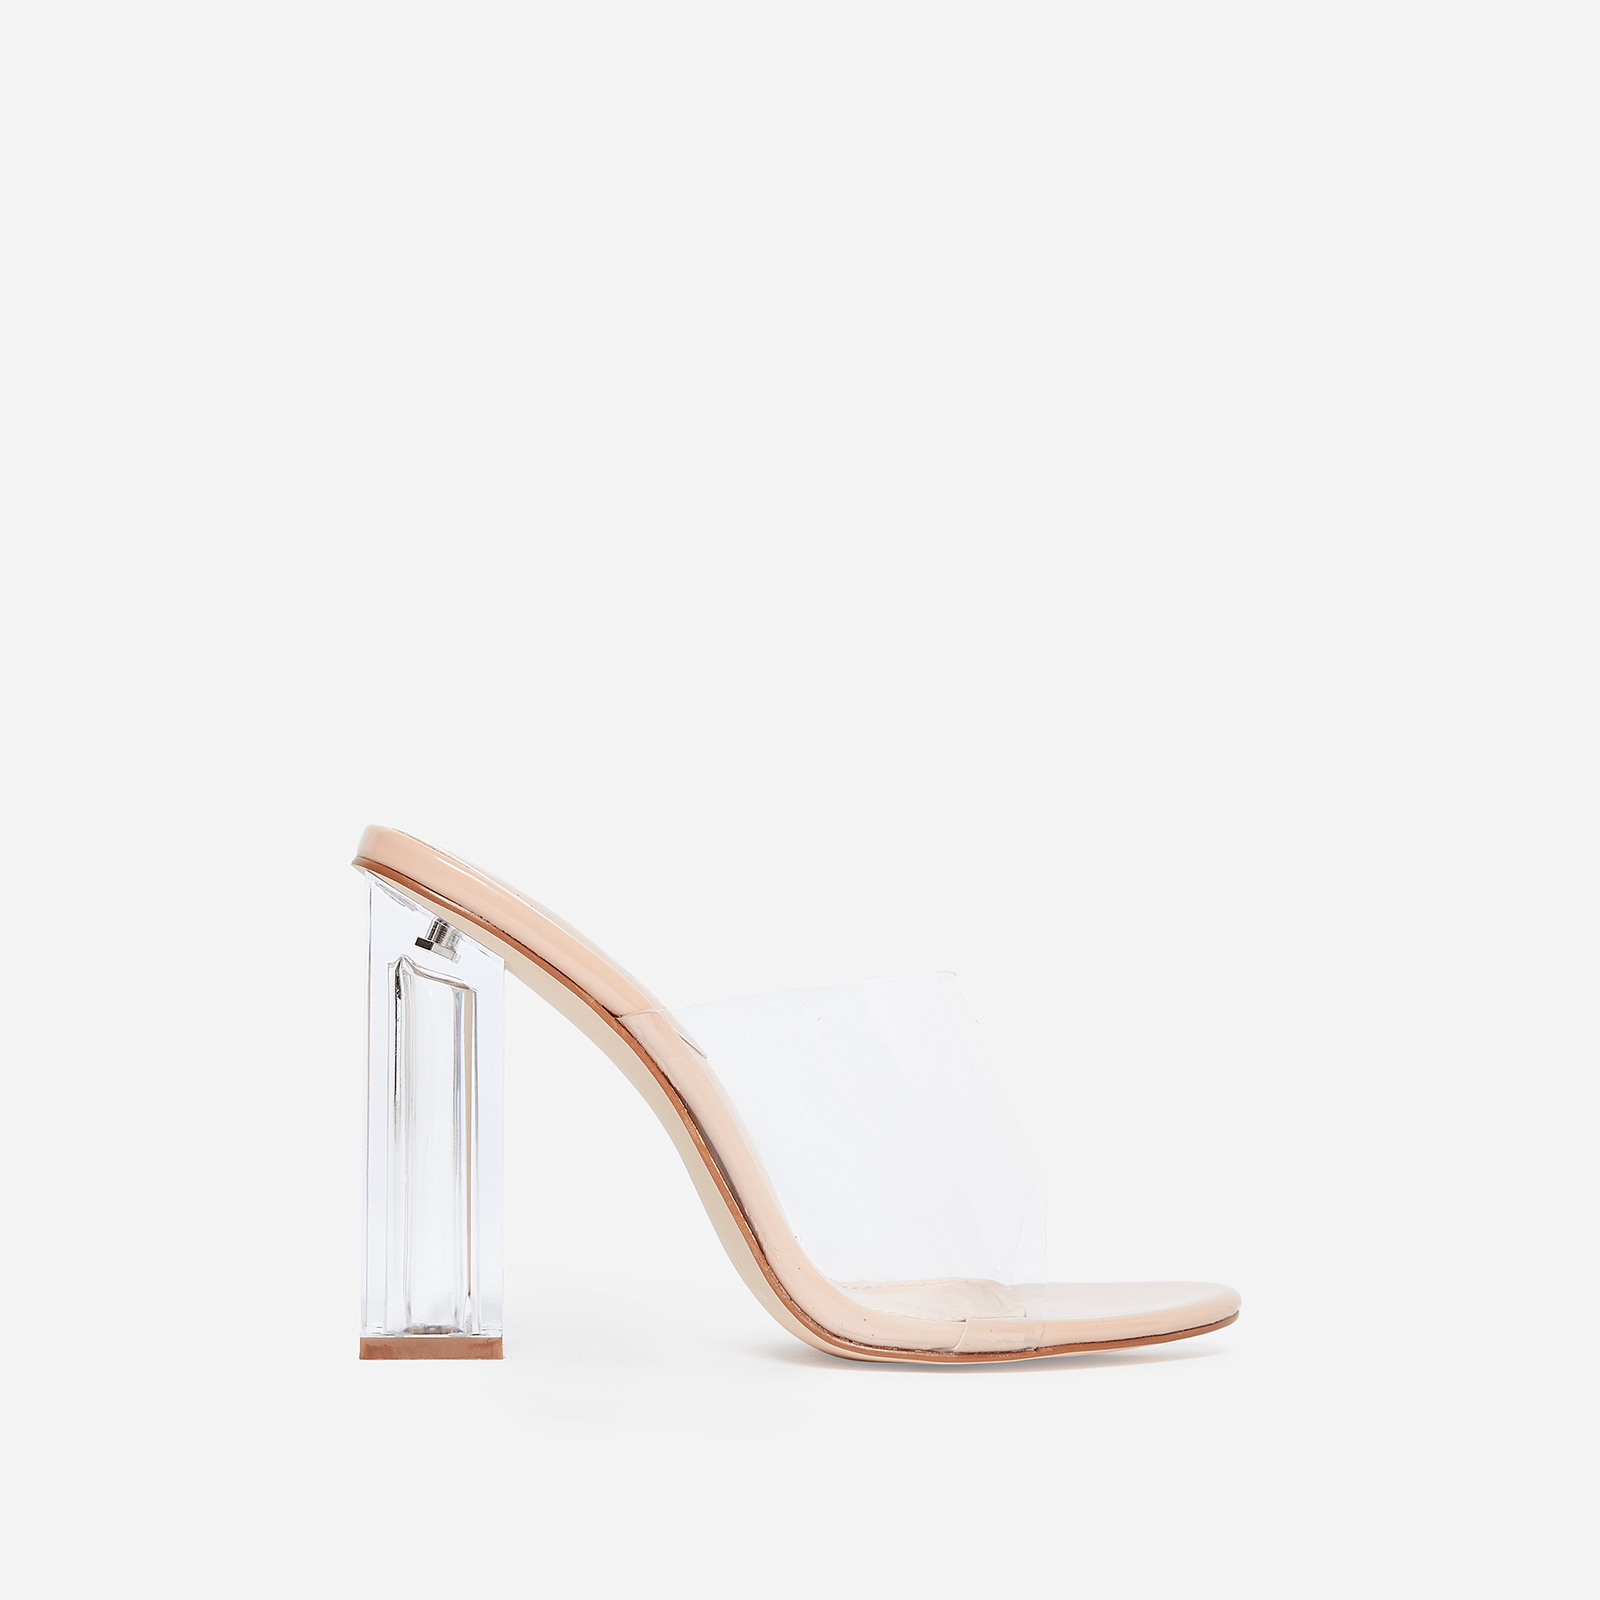 Fusion Perspex Block Heel Peep Toe Mule In Nude Patent